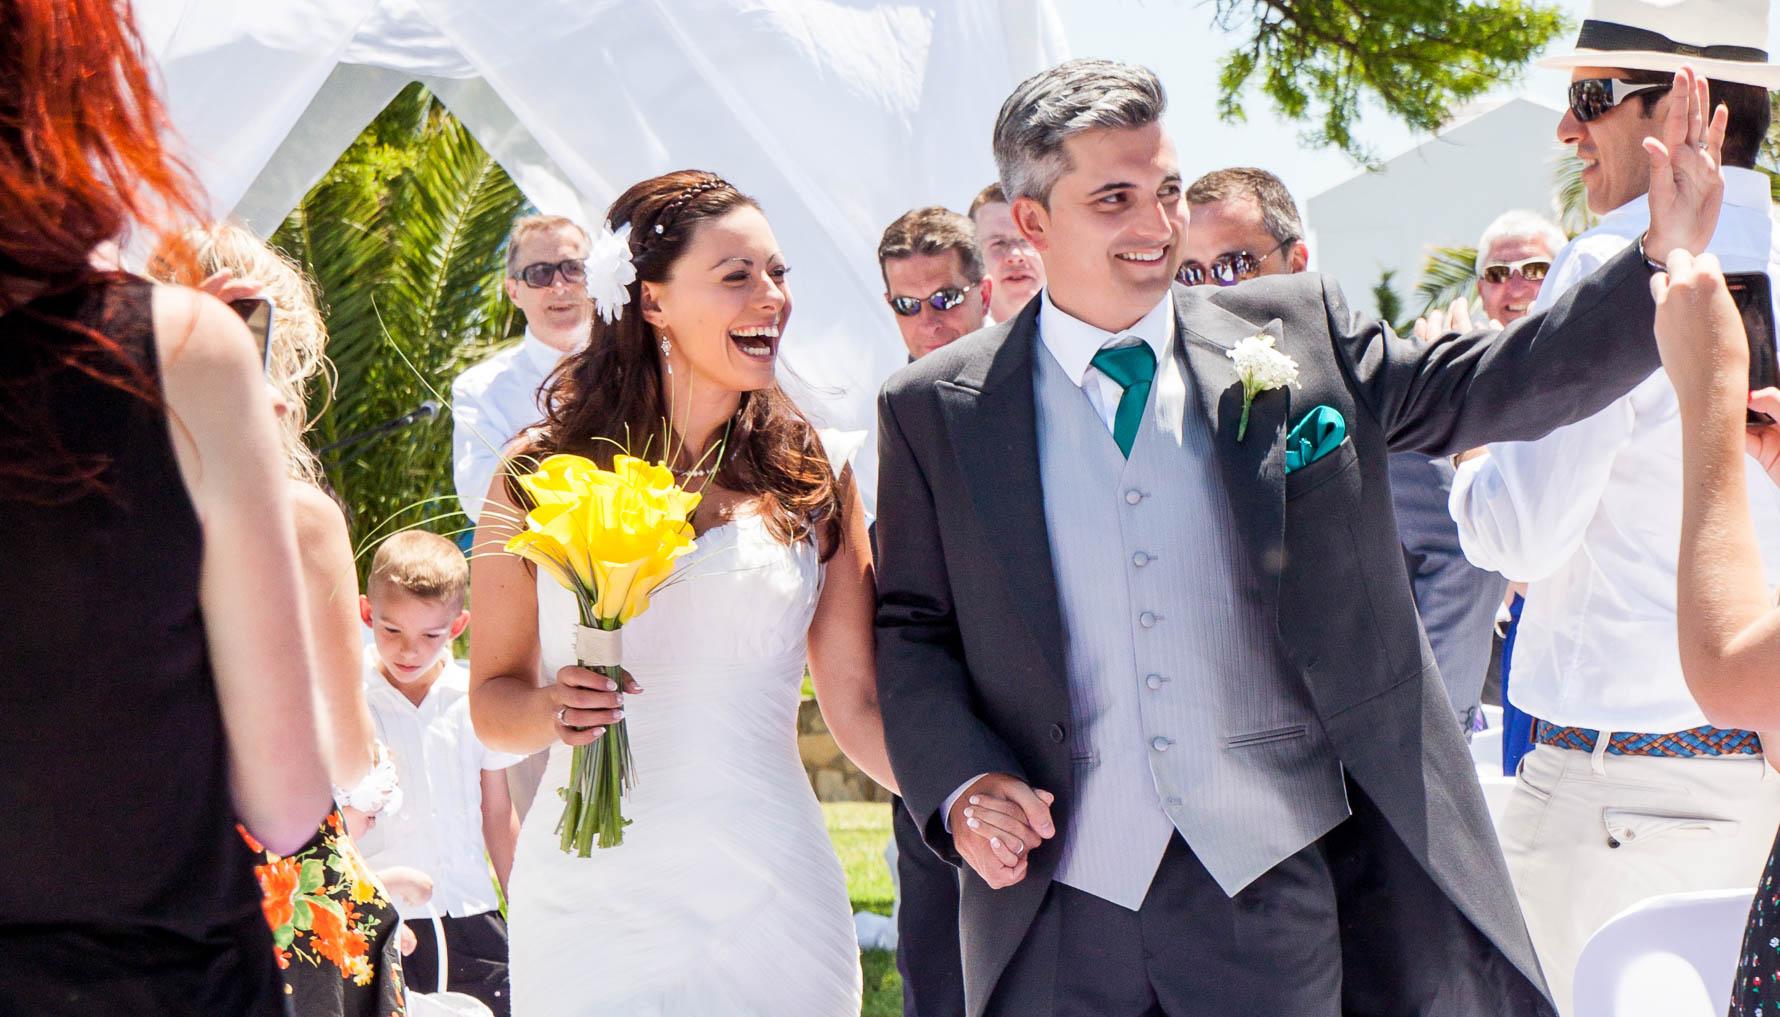 Happy couple walk down the aisle